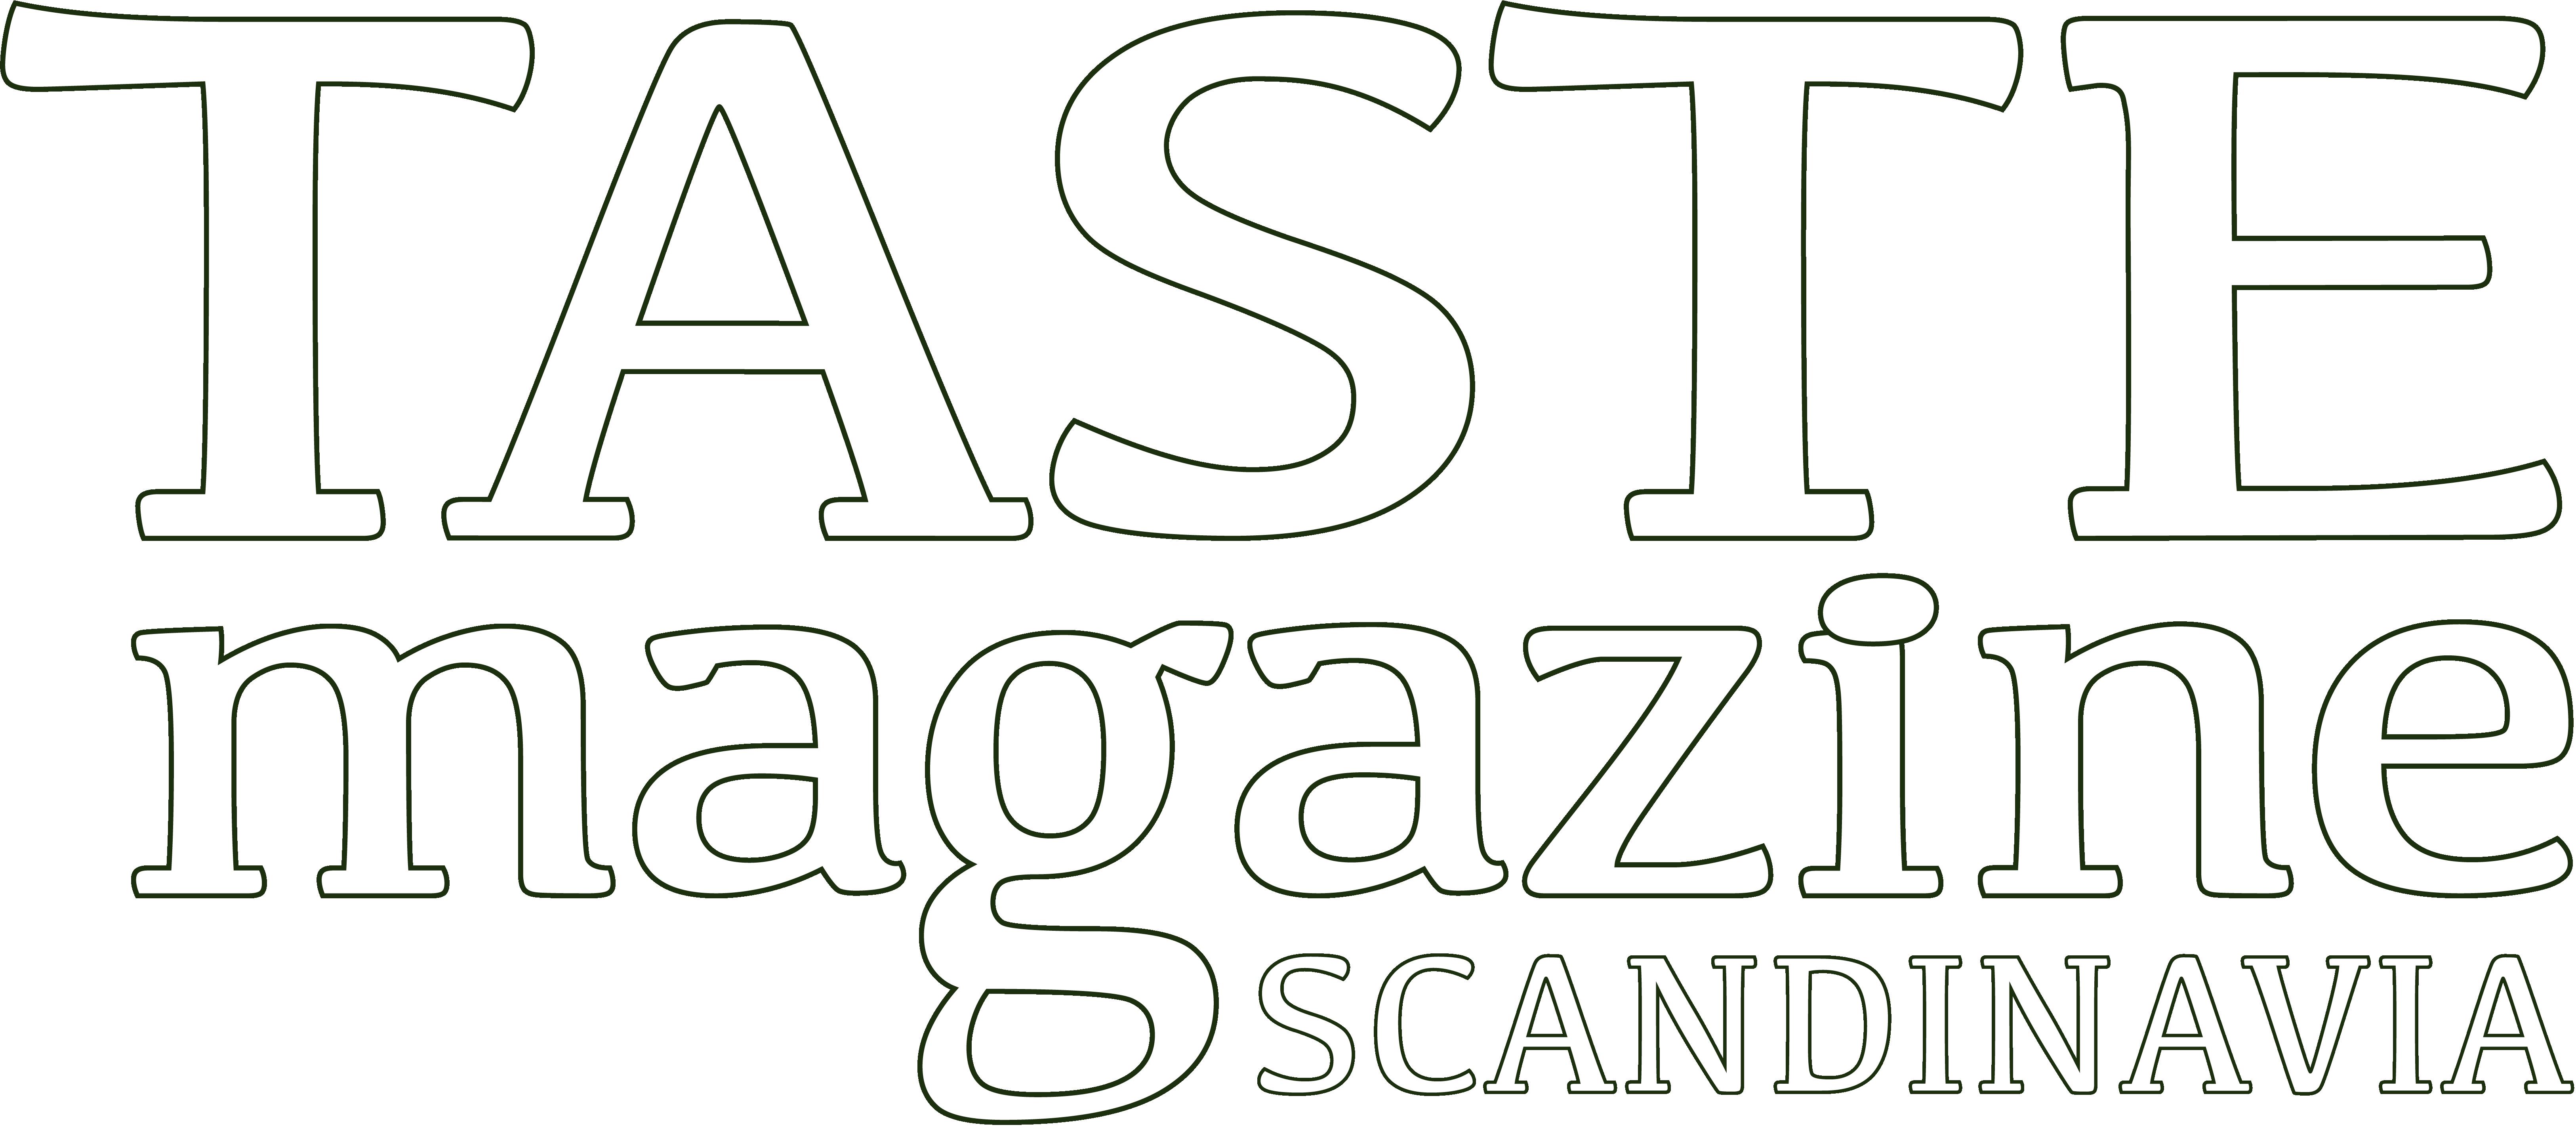 Taste Magazine Scandinavia